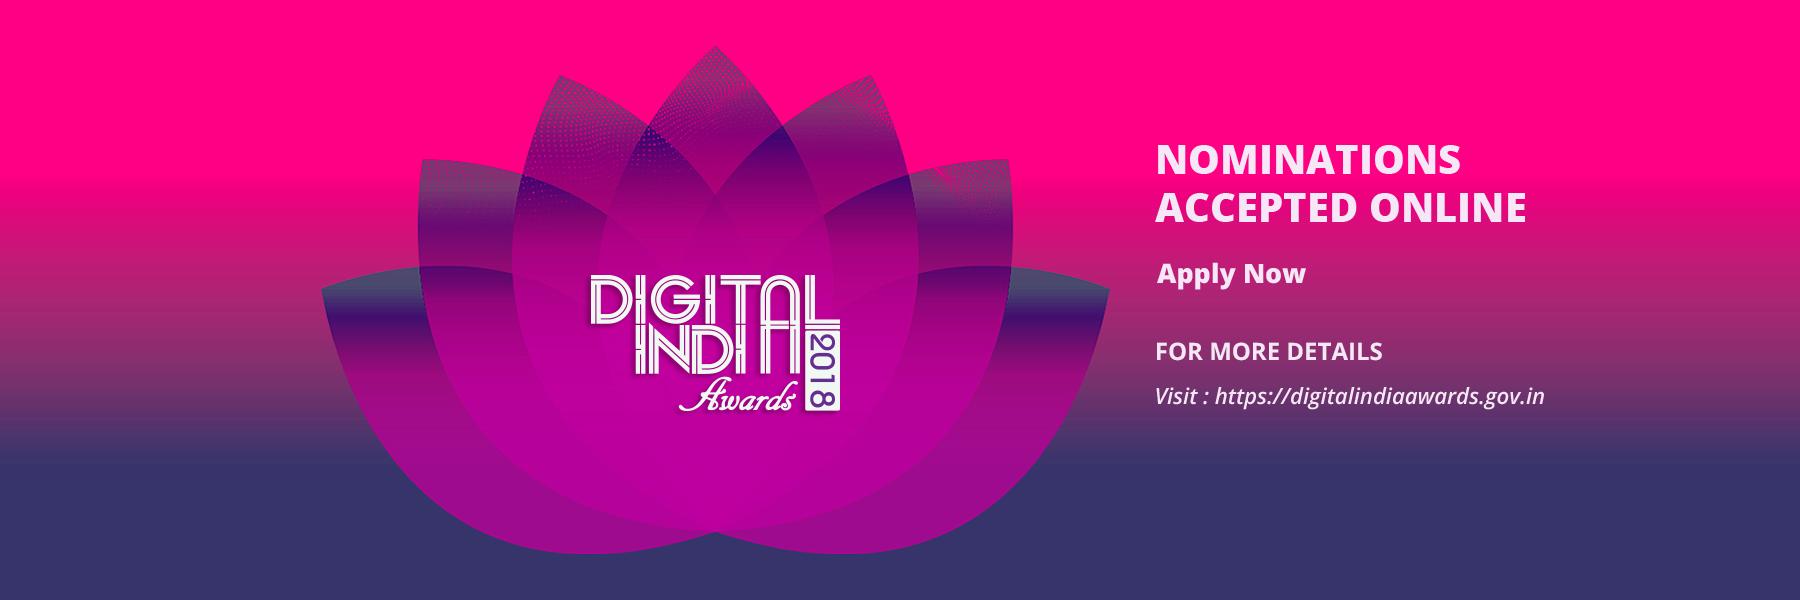 Digital India Awards 2018